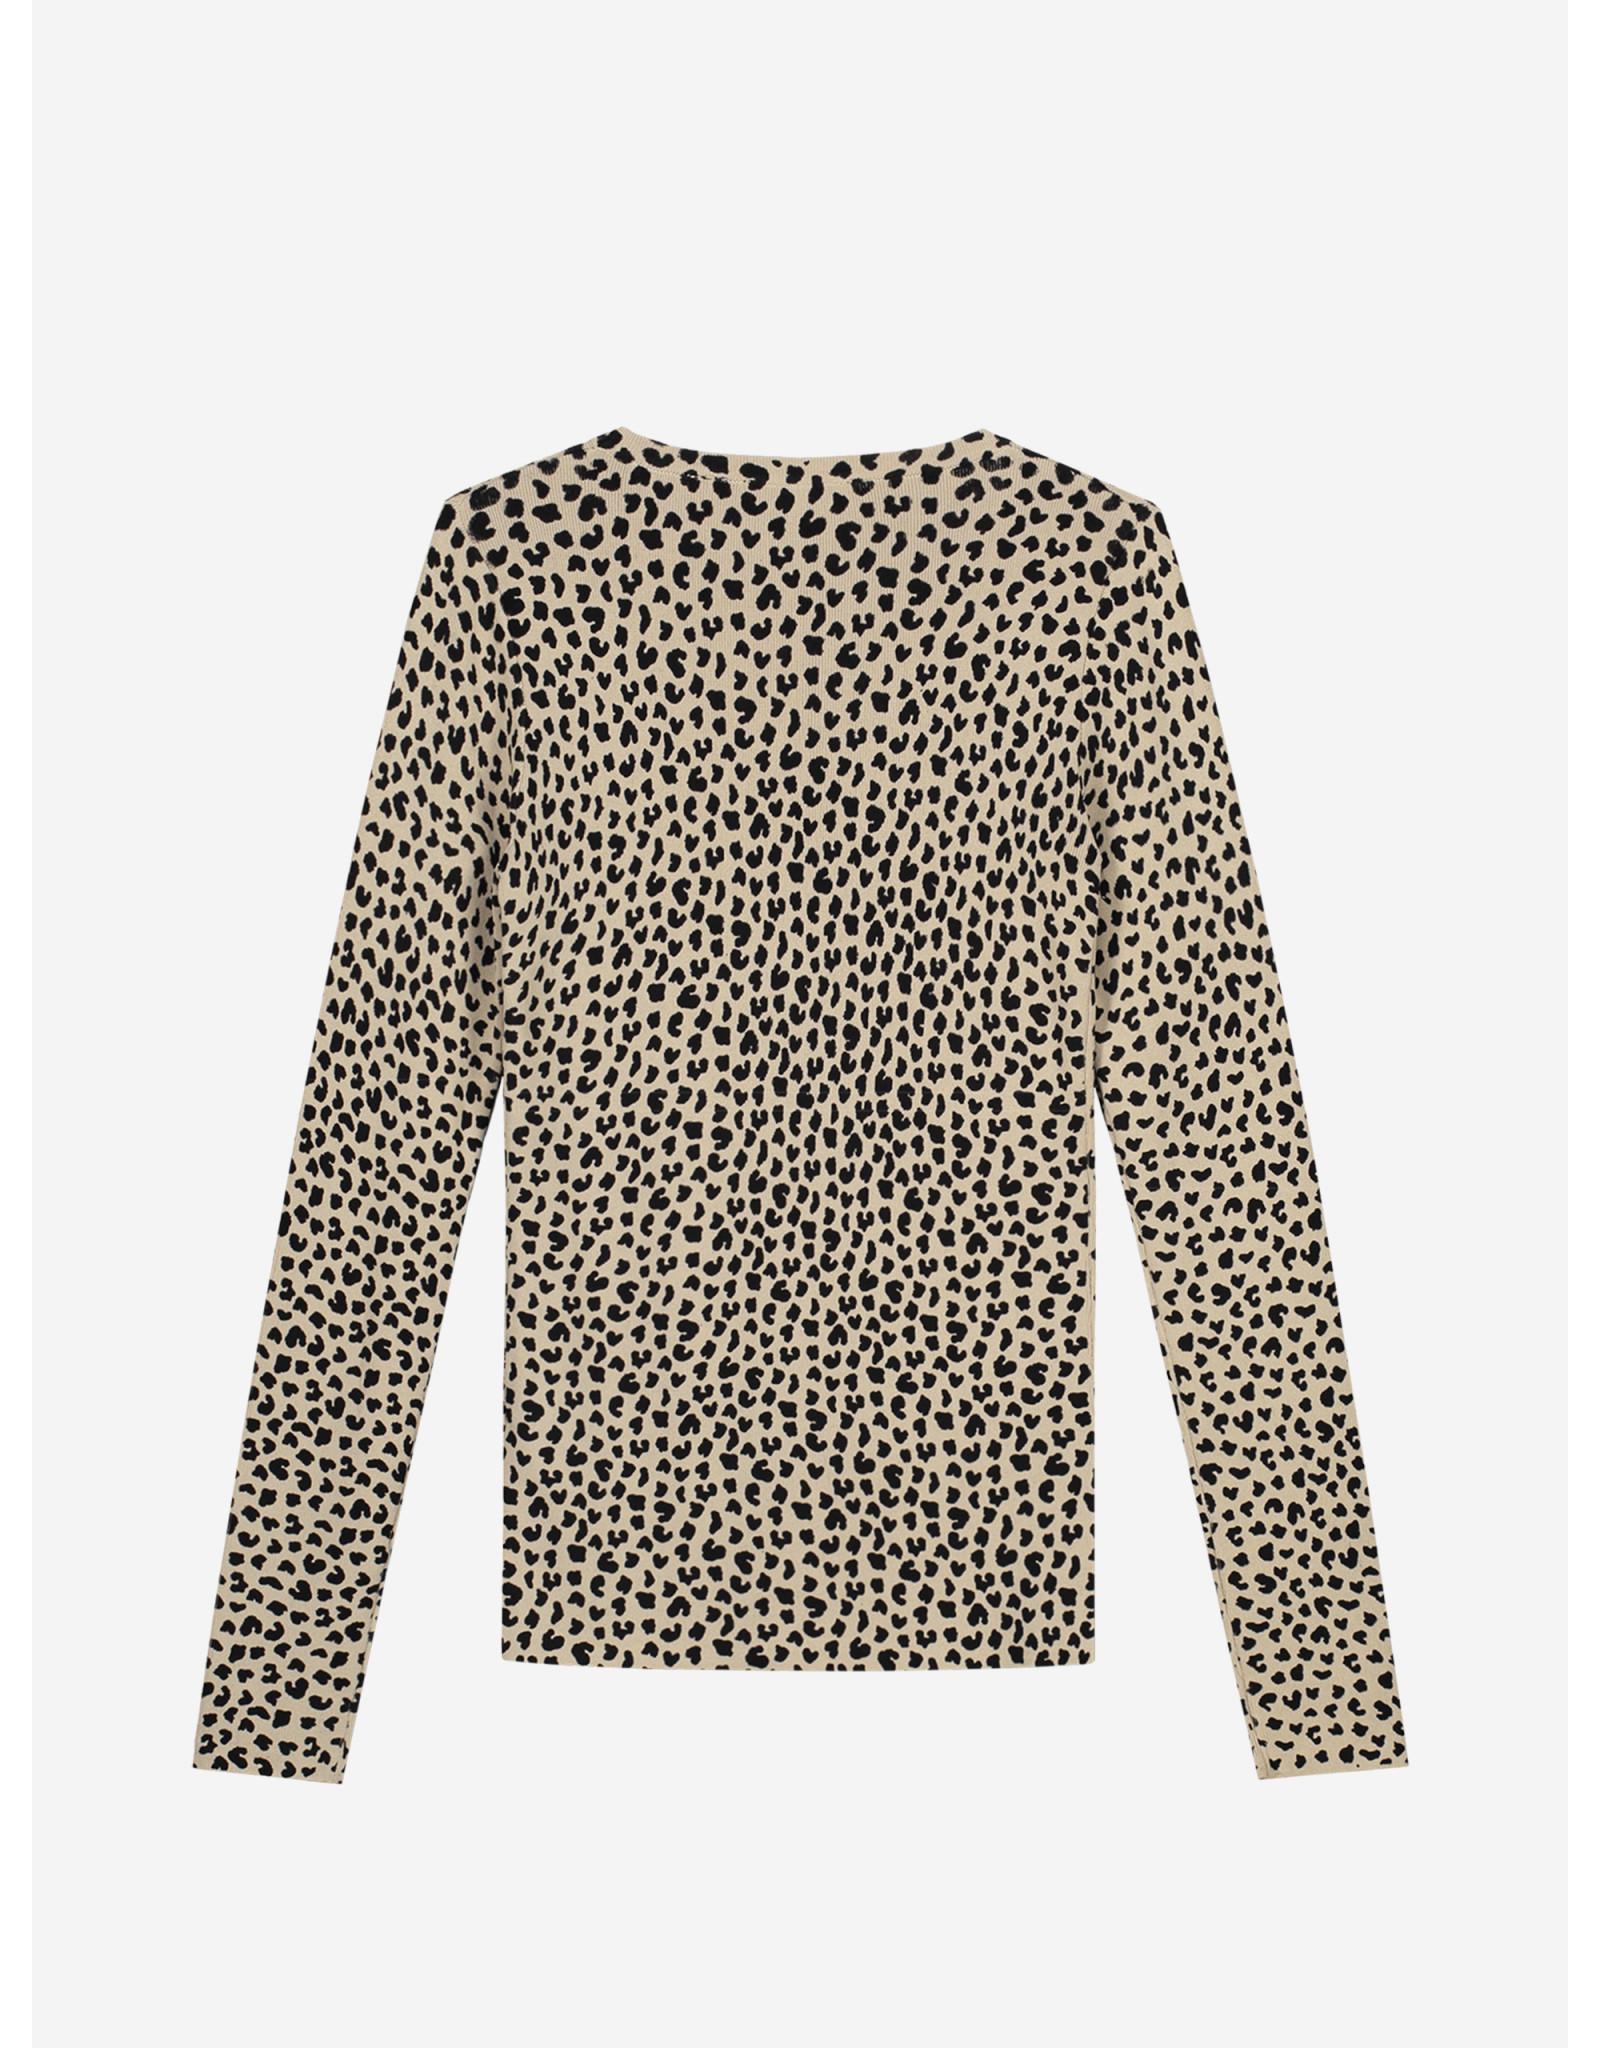 Nik & Nik Jolie leopard Top